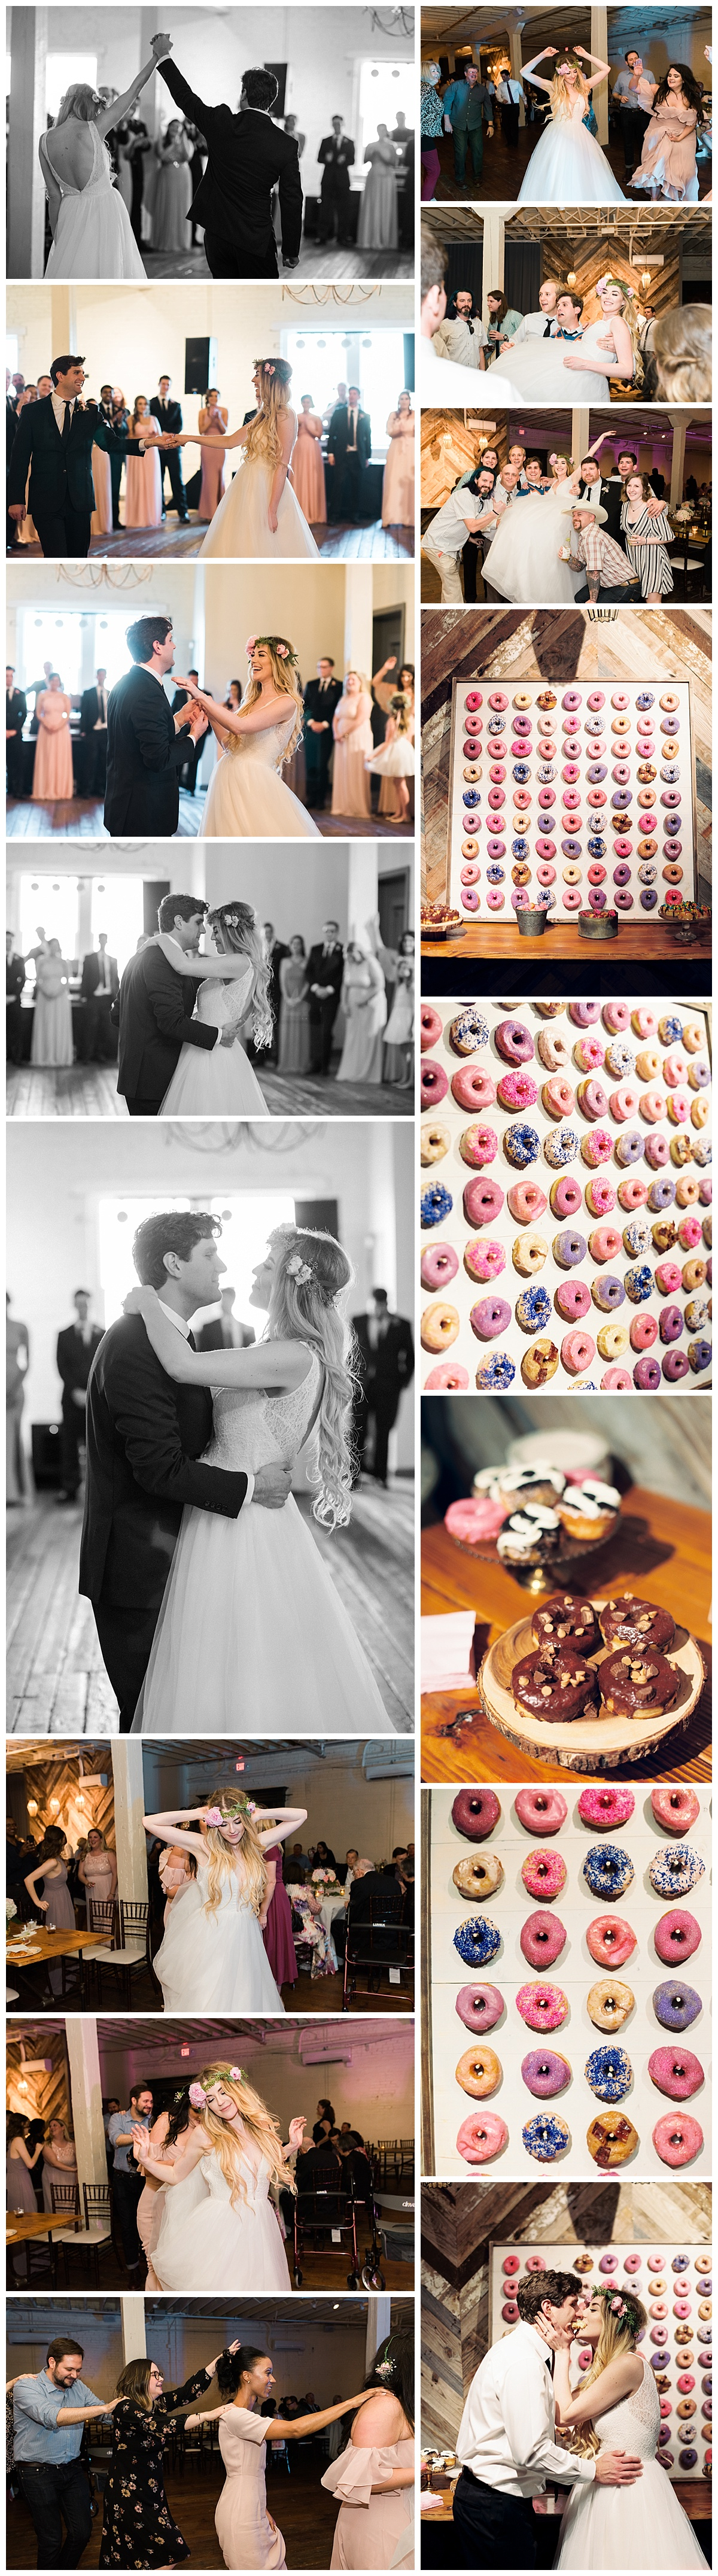 brik-venue-wedding-ar-photography-6.jpg